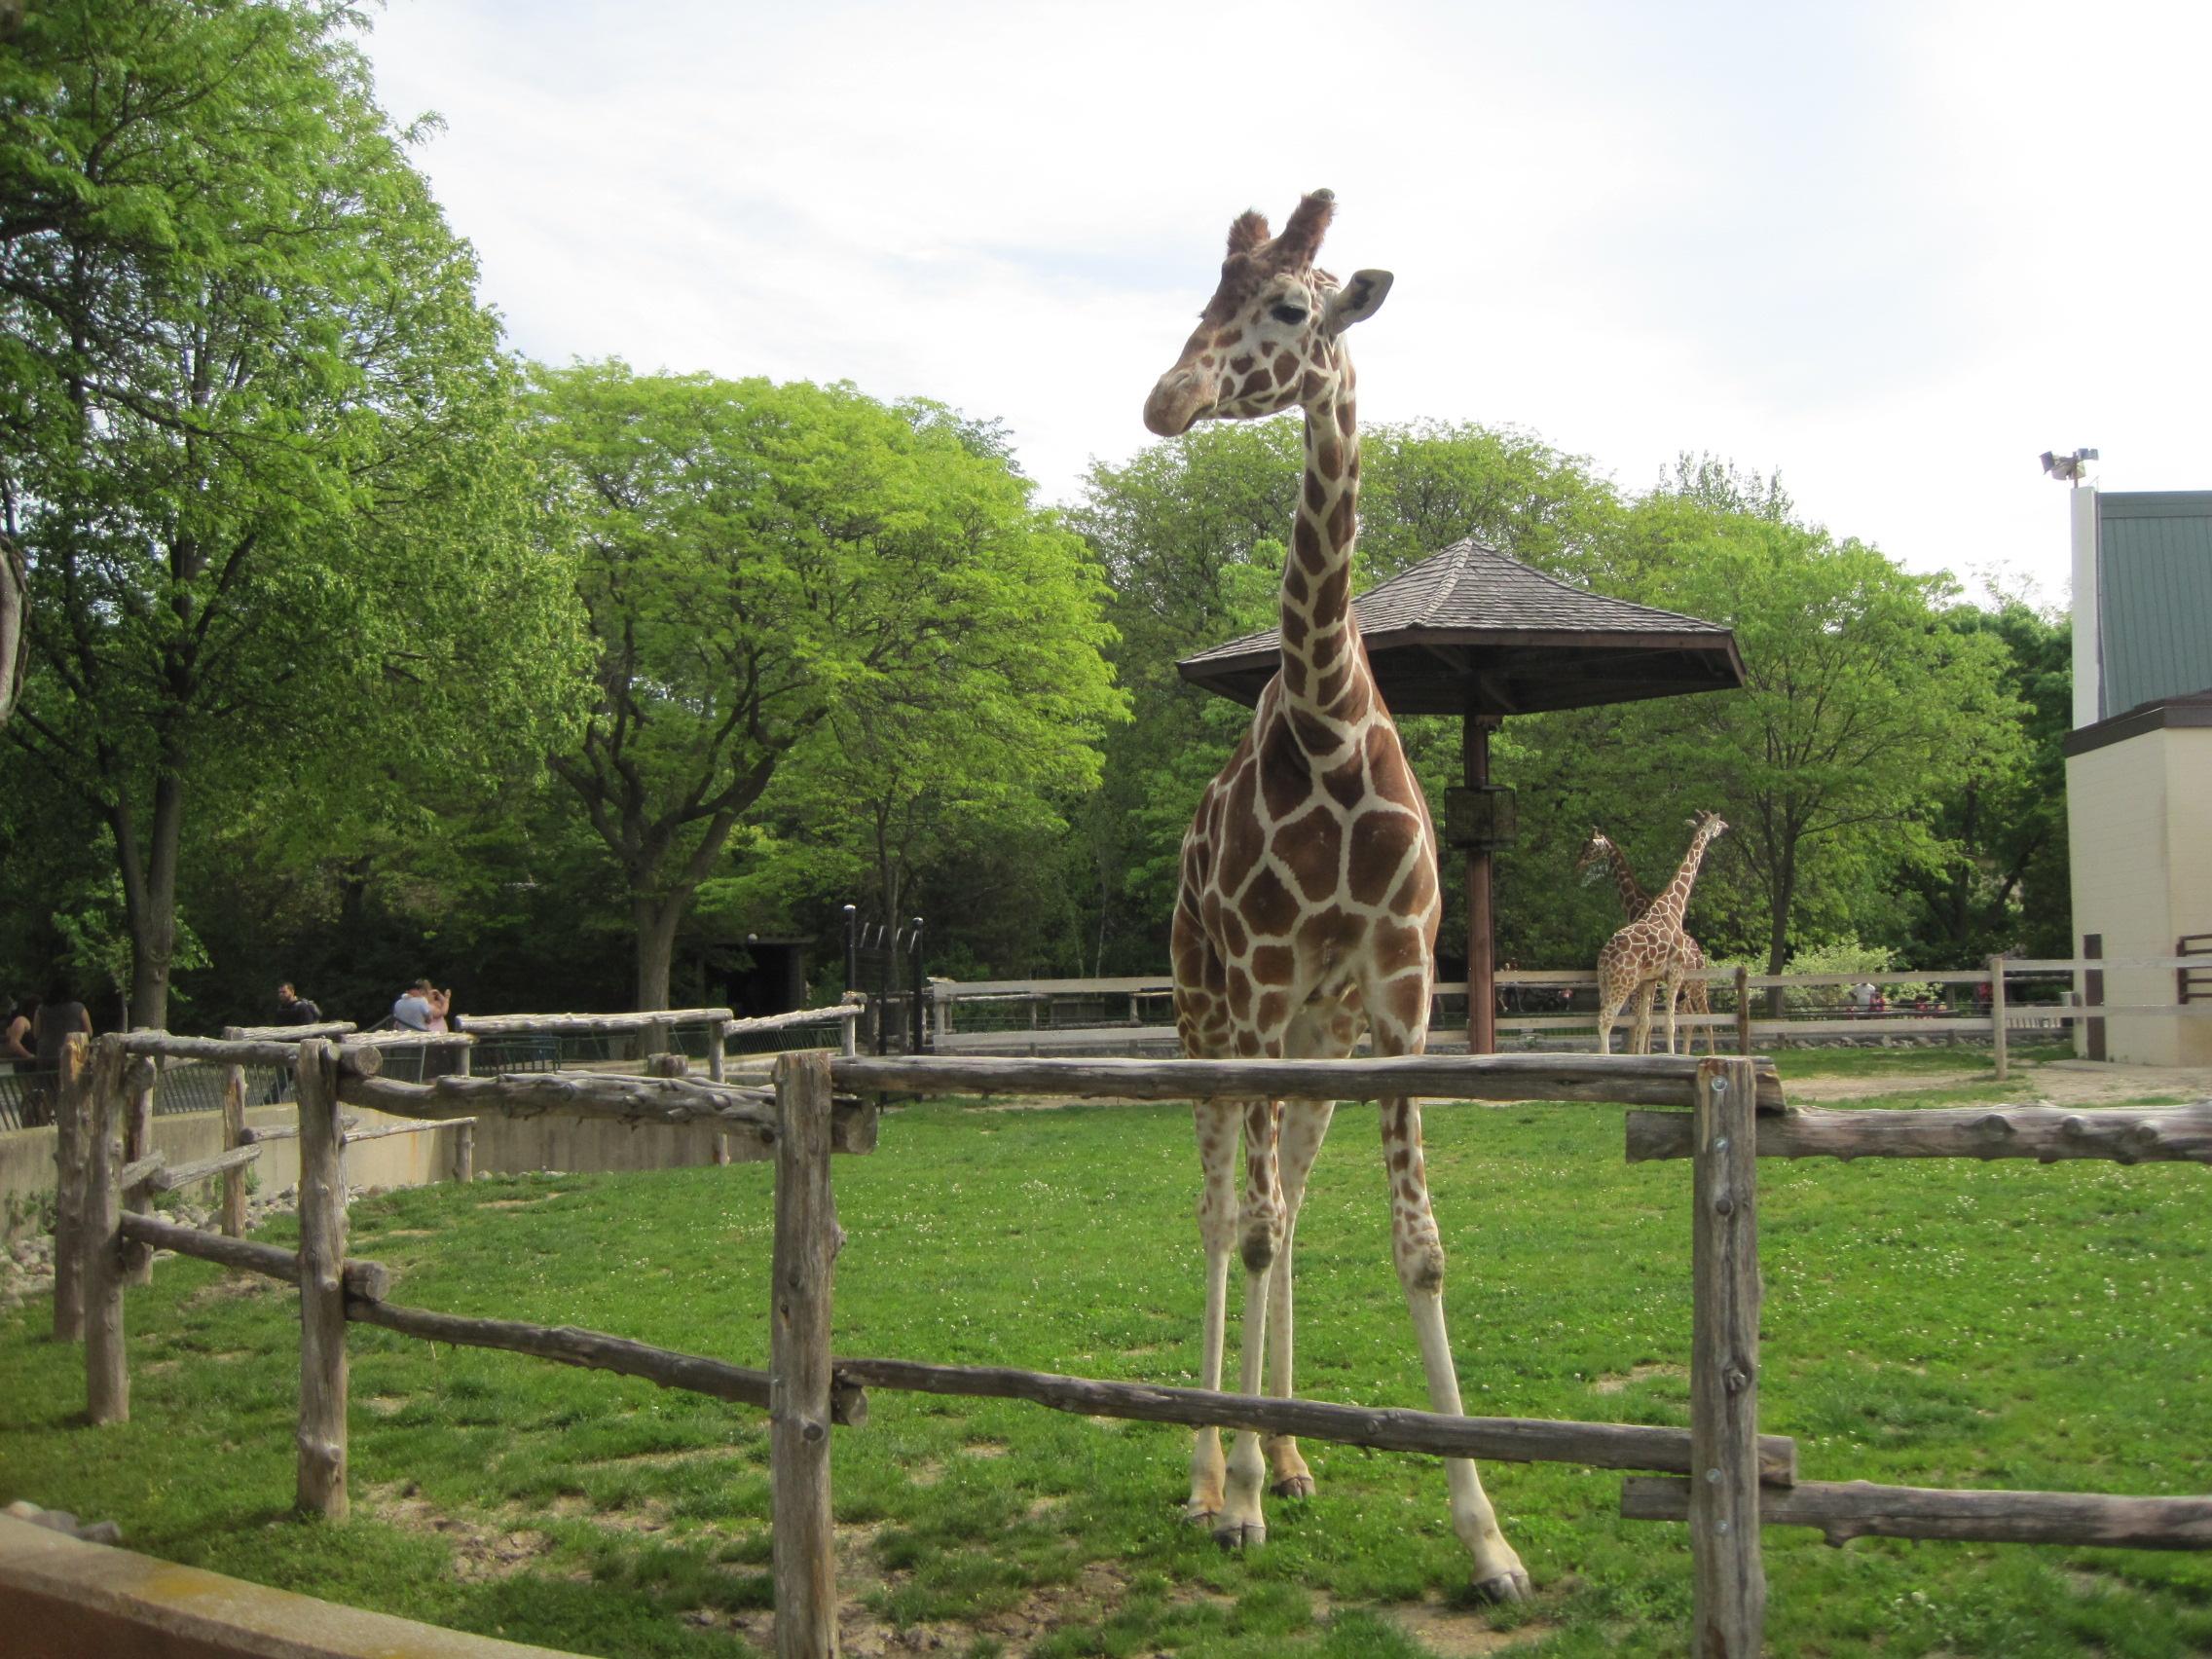 Giraffes at Henry Vilas Zoo